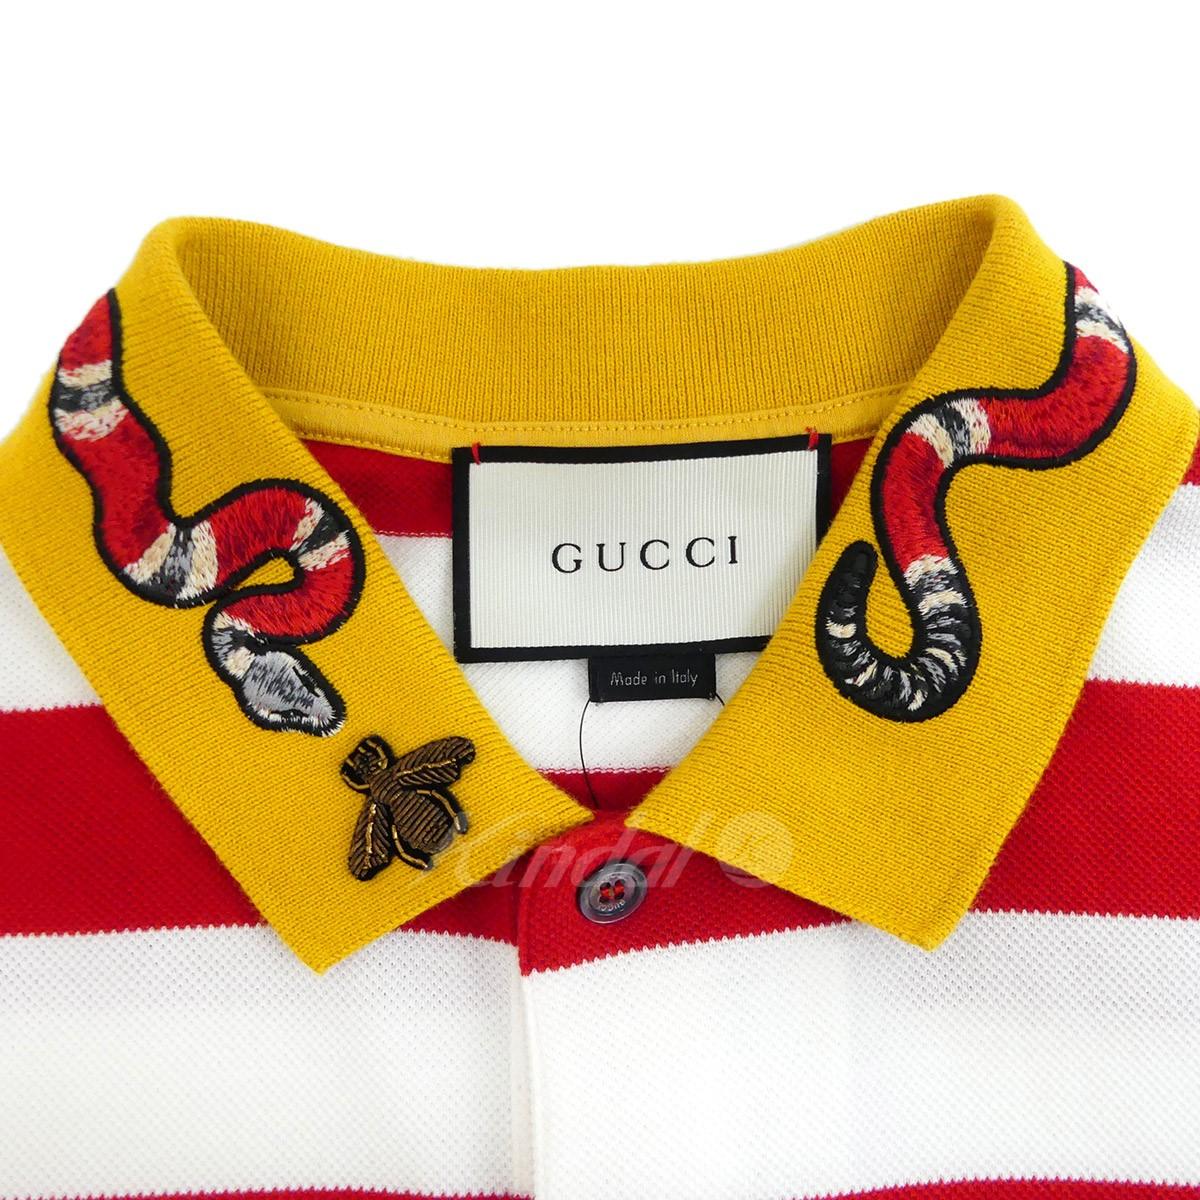 7e04abe4 ... GUCCI horizontal stripe fawn polo shirt 2016SS snake embroidery red X  white size: L ...